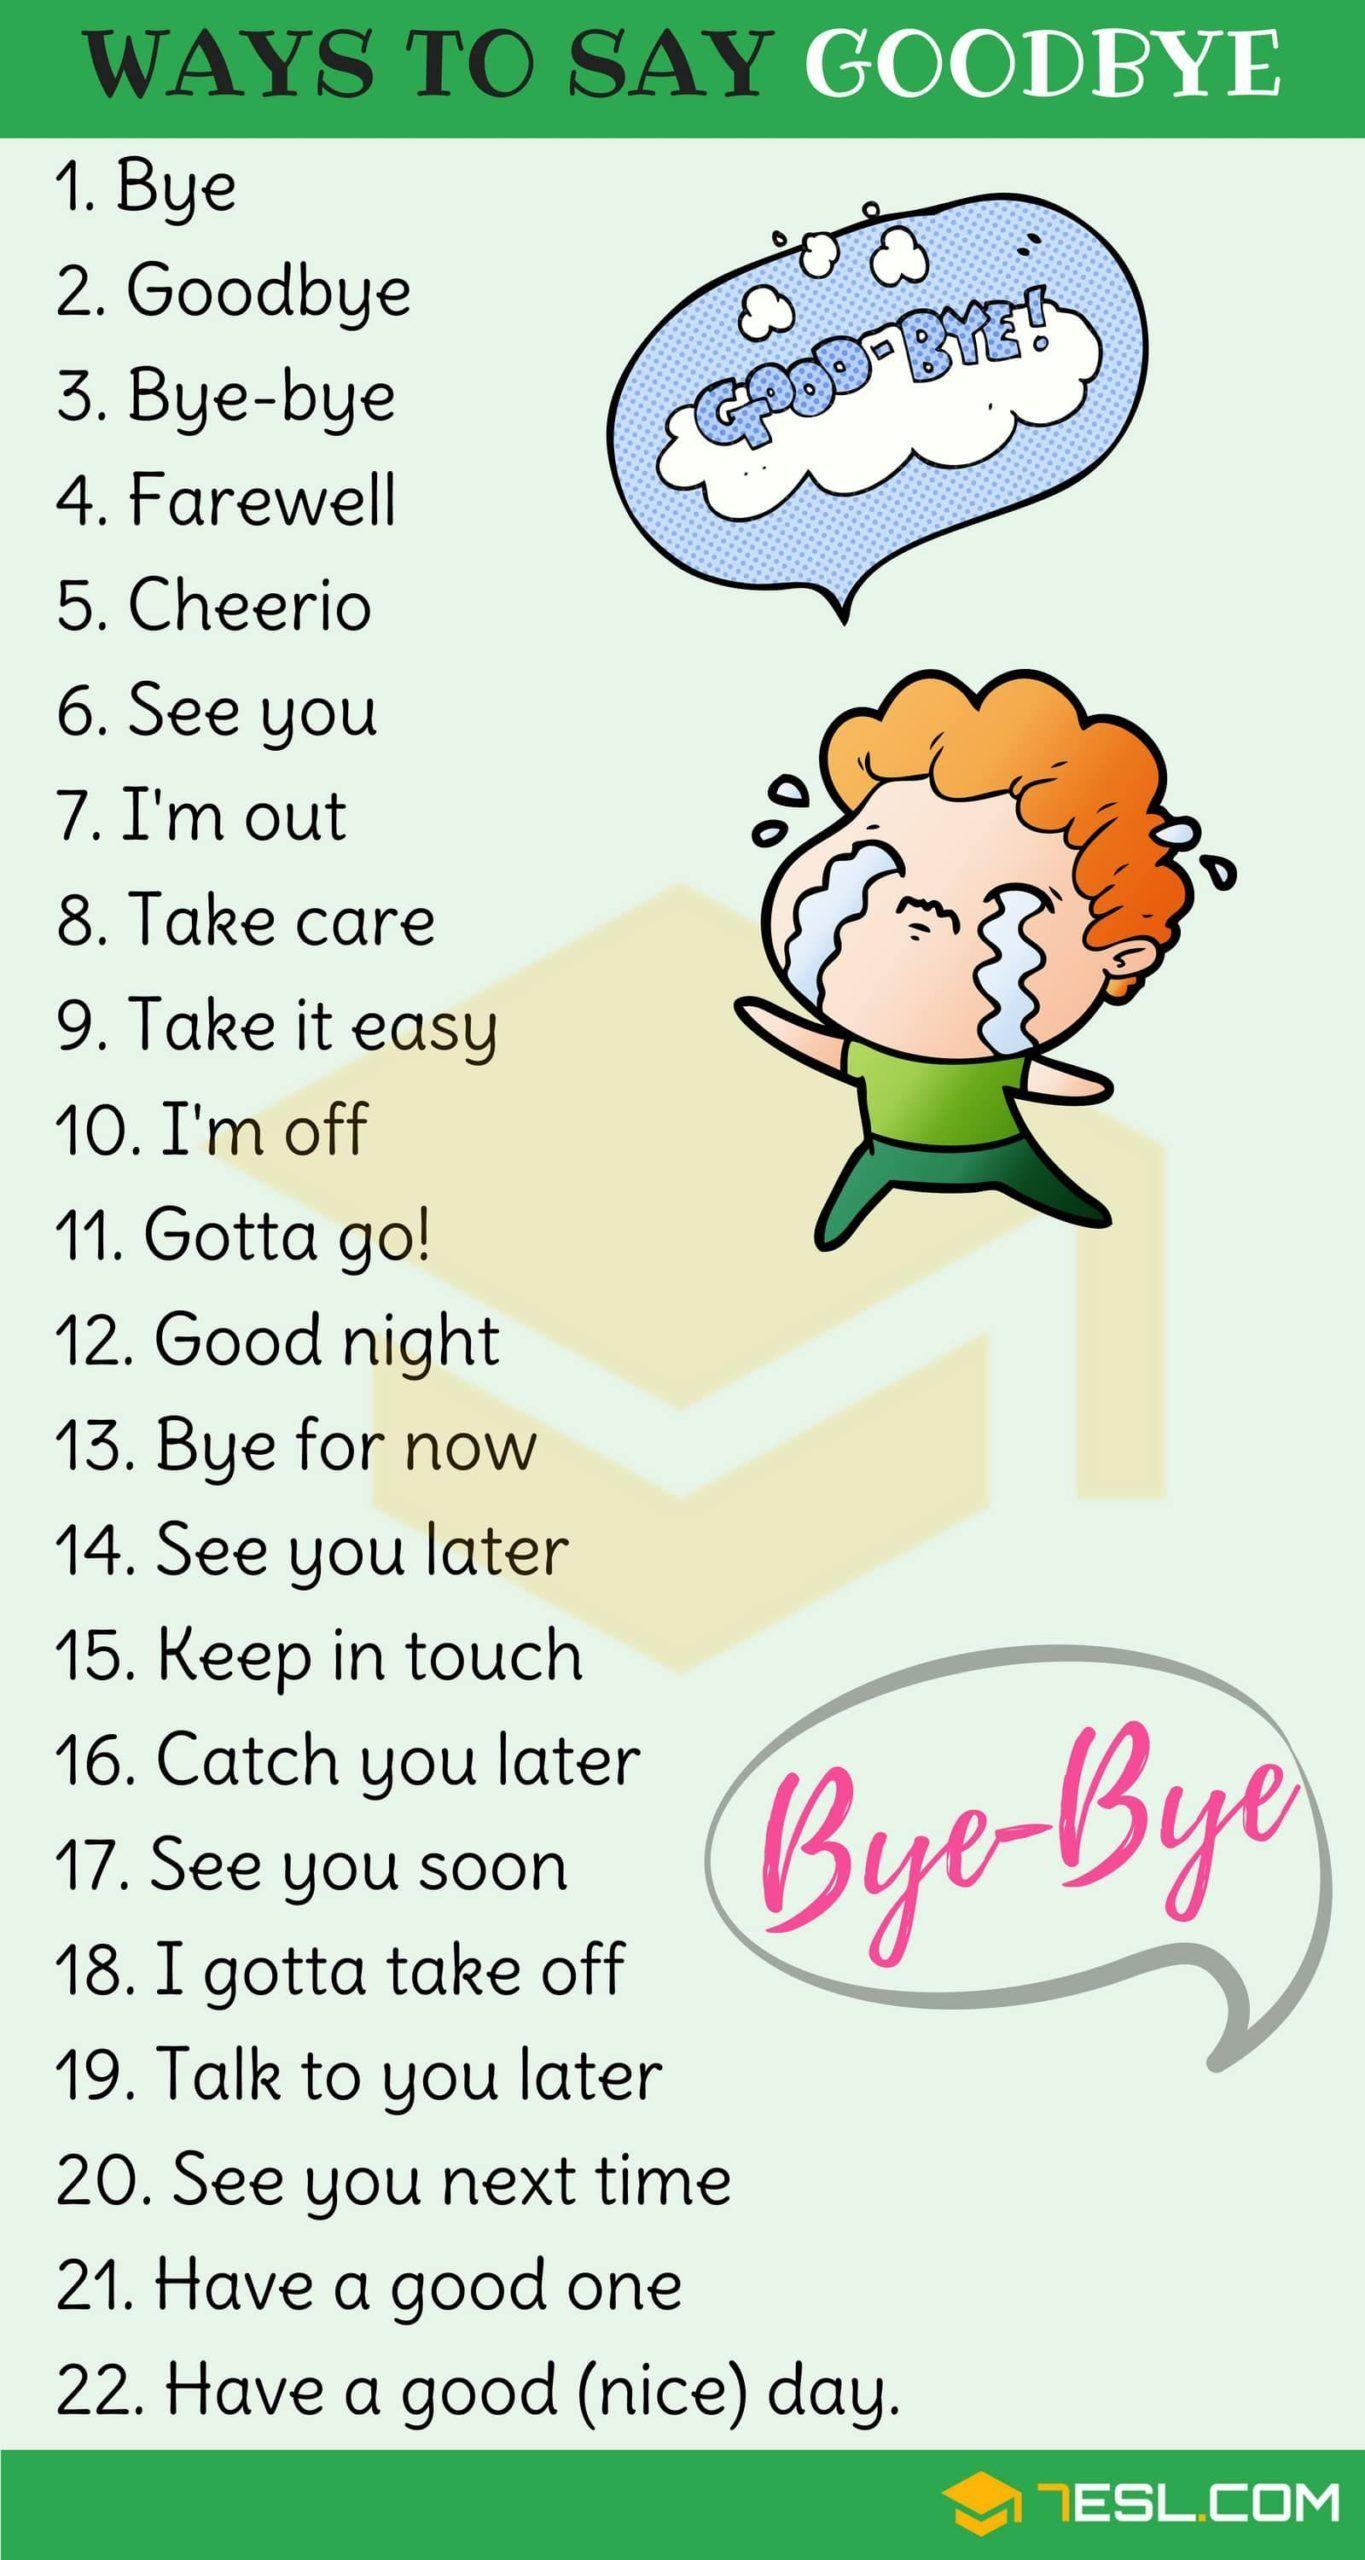 23 Ways to Say Goodbye in English | Goodbye Synonyms - #